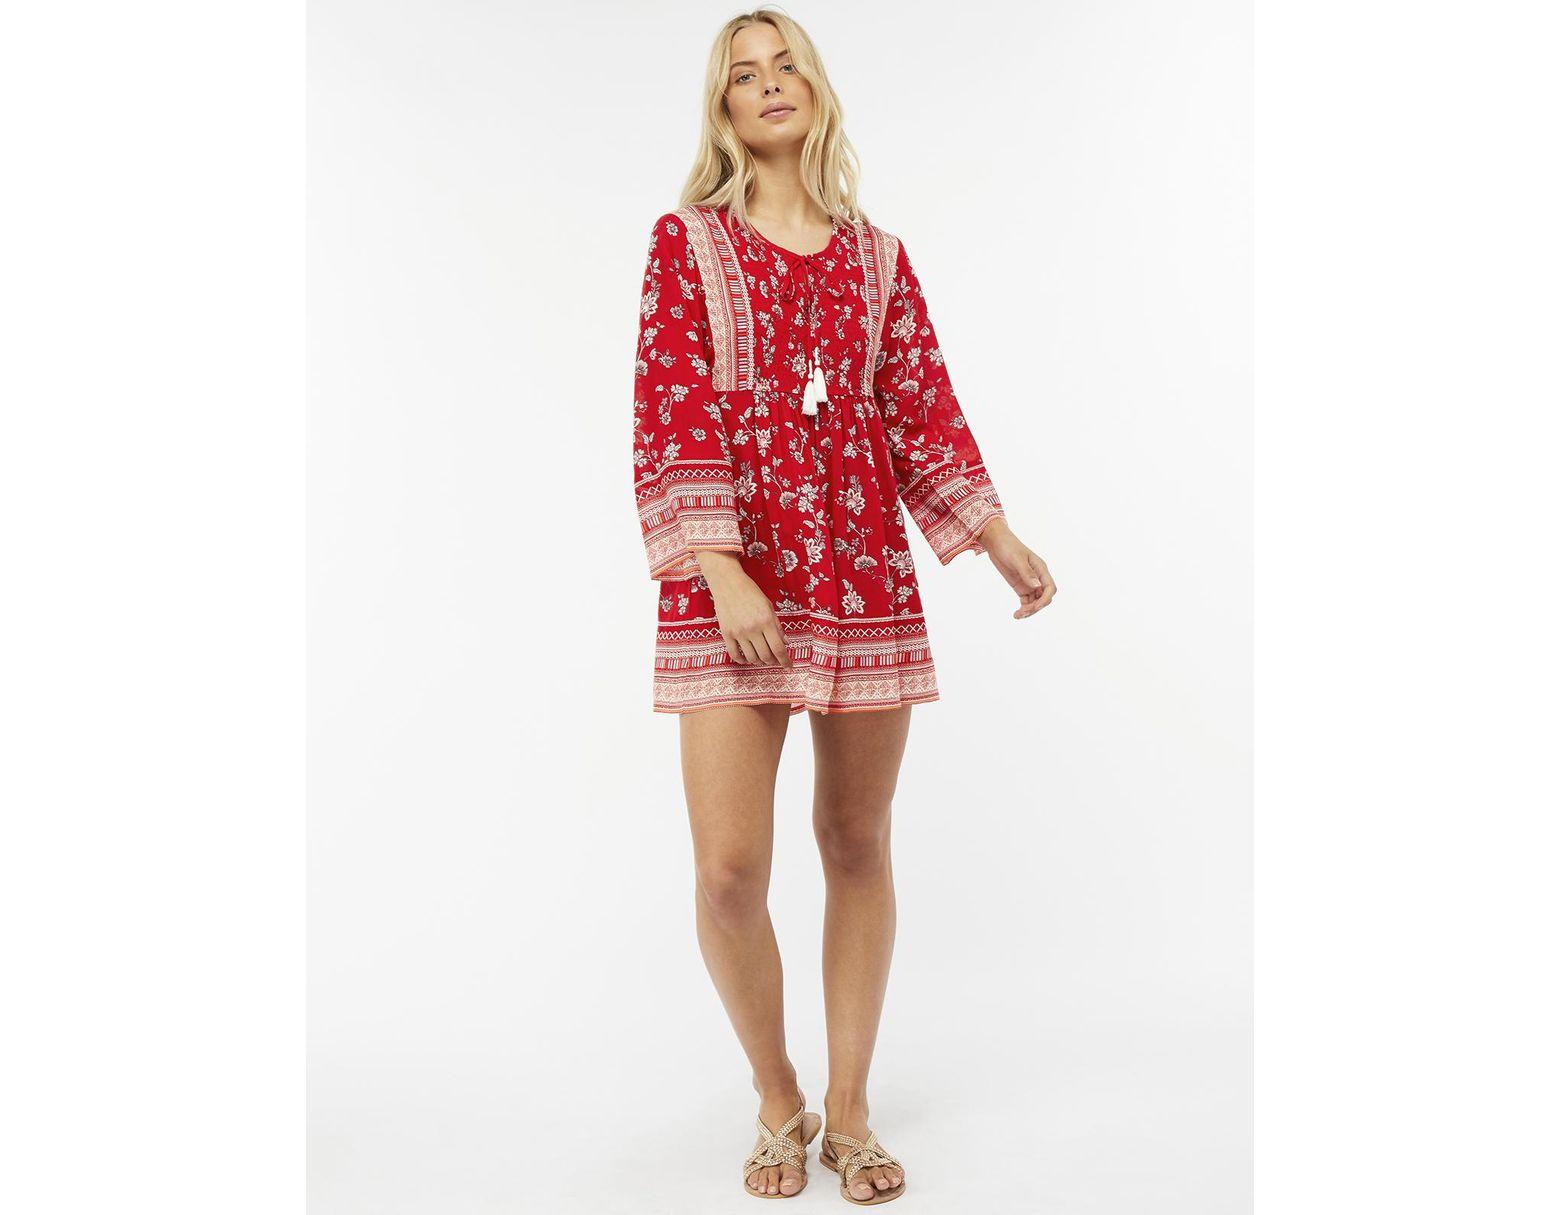 5f684d3555cf7 Monsoon Priscilla Print Dress in Red - Lyst